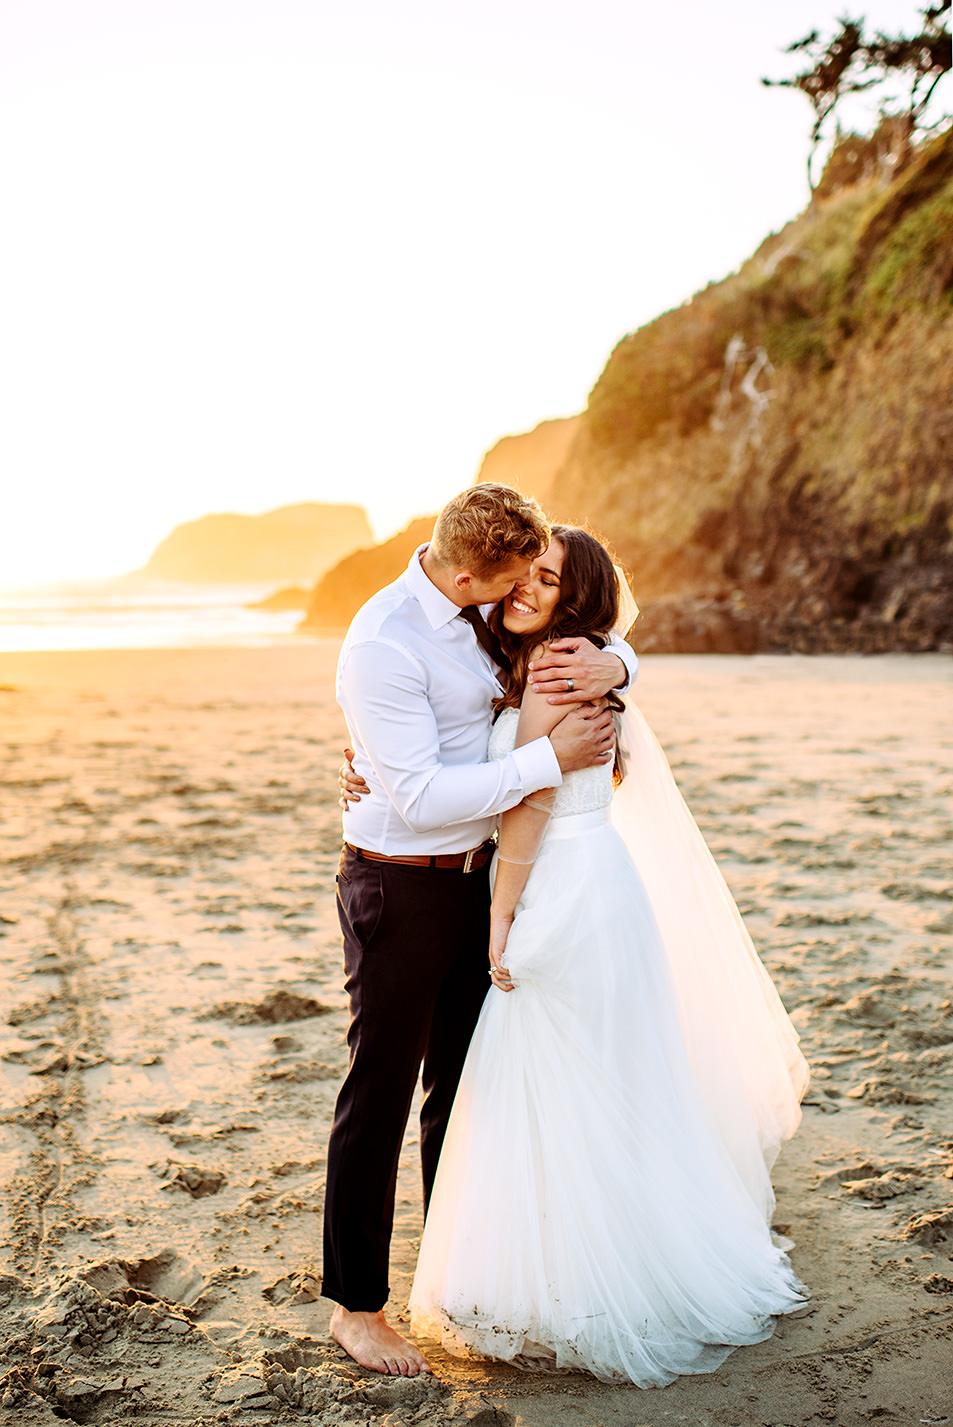 cannon-beach-wedding-portland-wedding-photography63.jpg